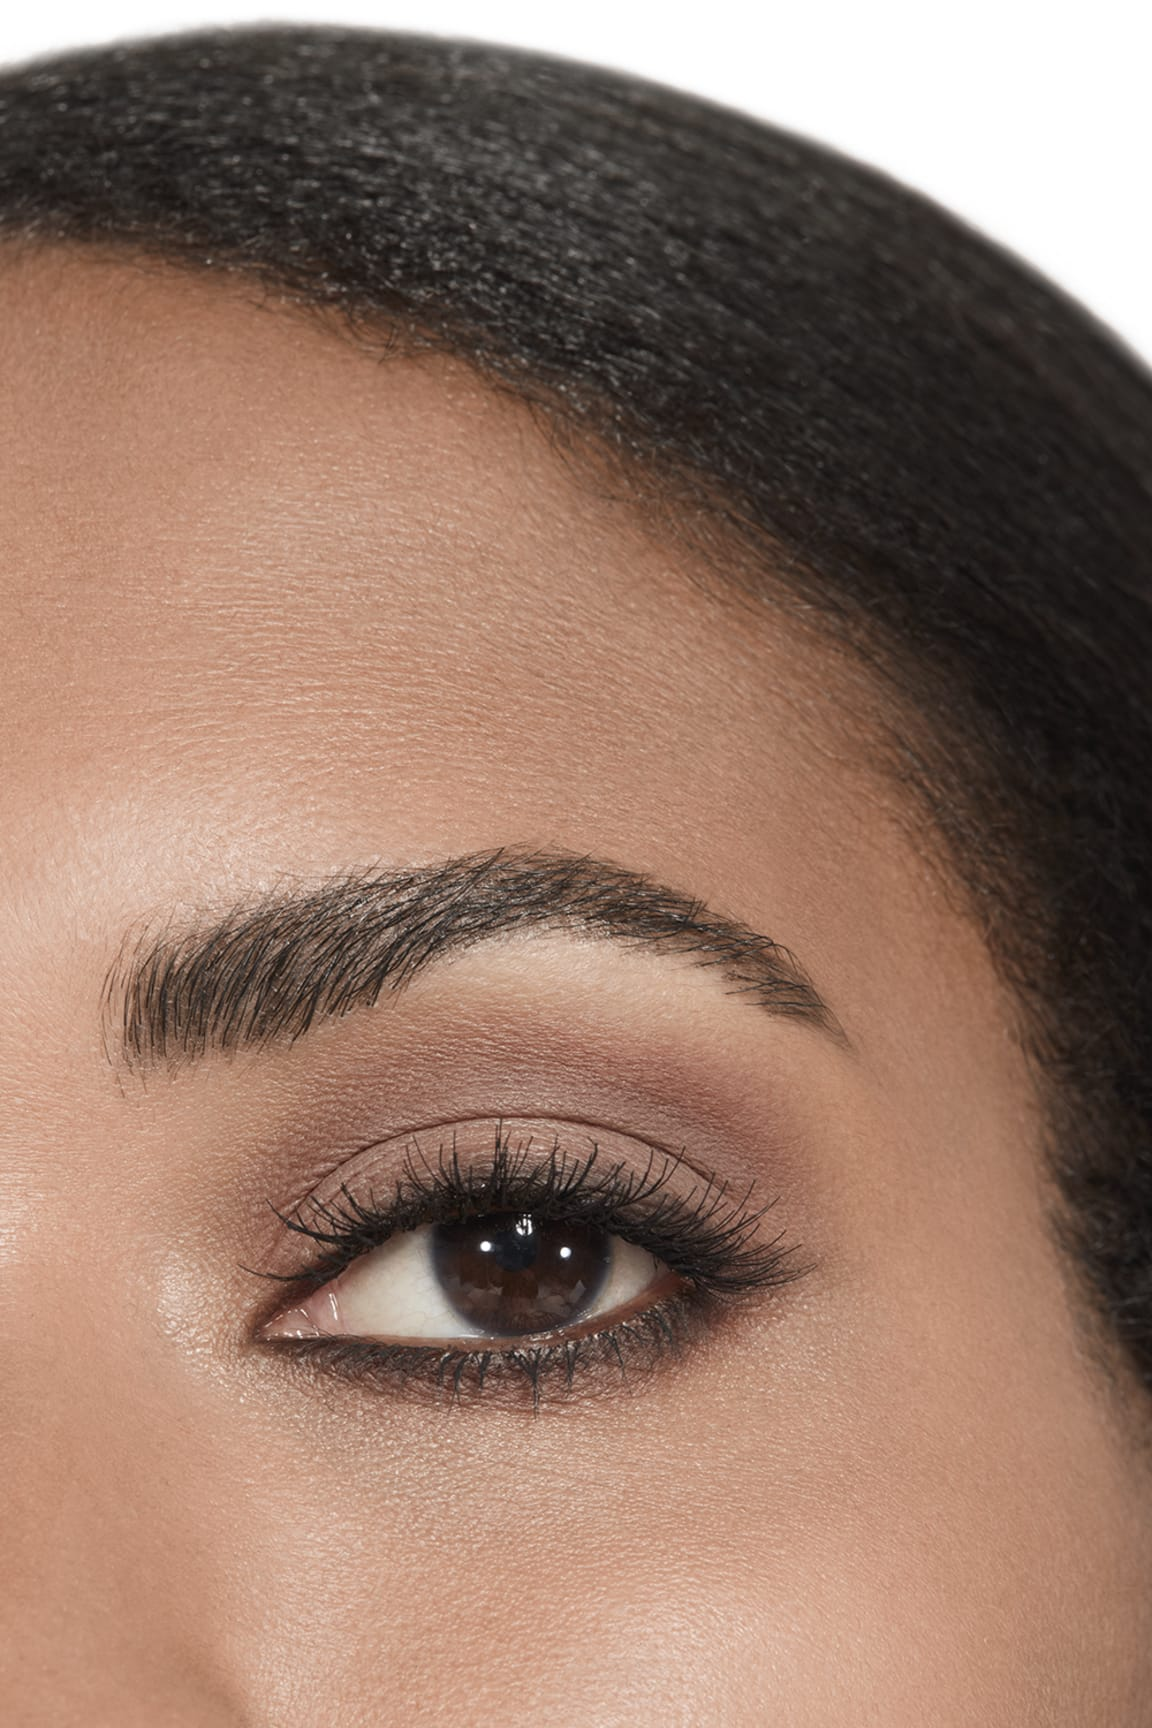 Application makeup visual 2 - LES 4 OMBRES 308 - CLAIR-OBSCUR